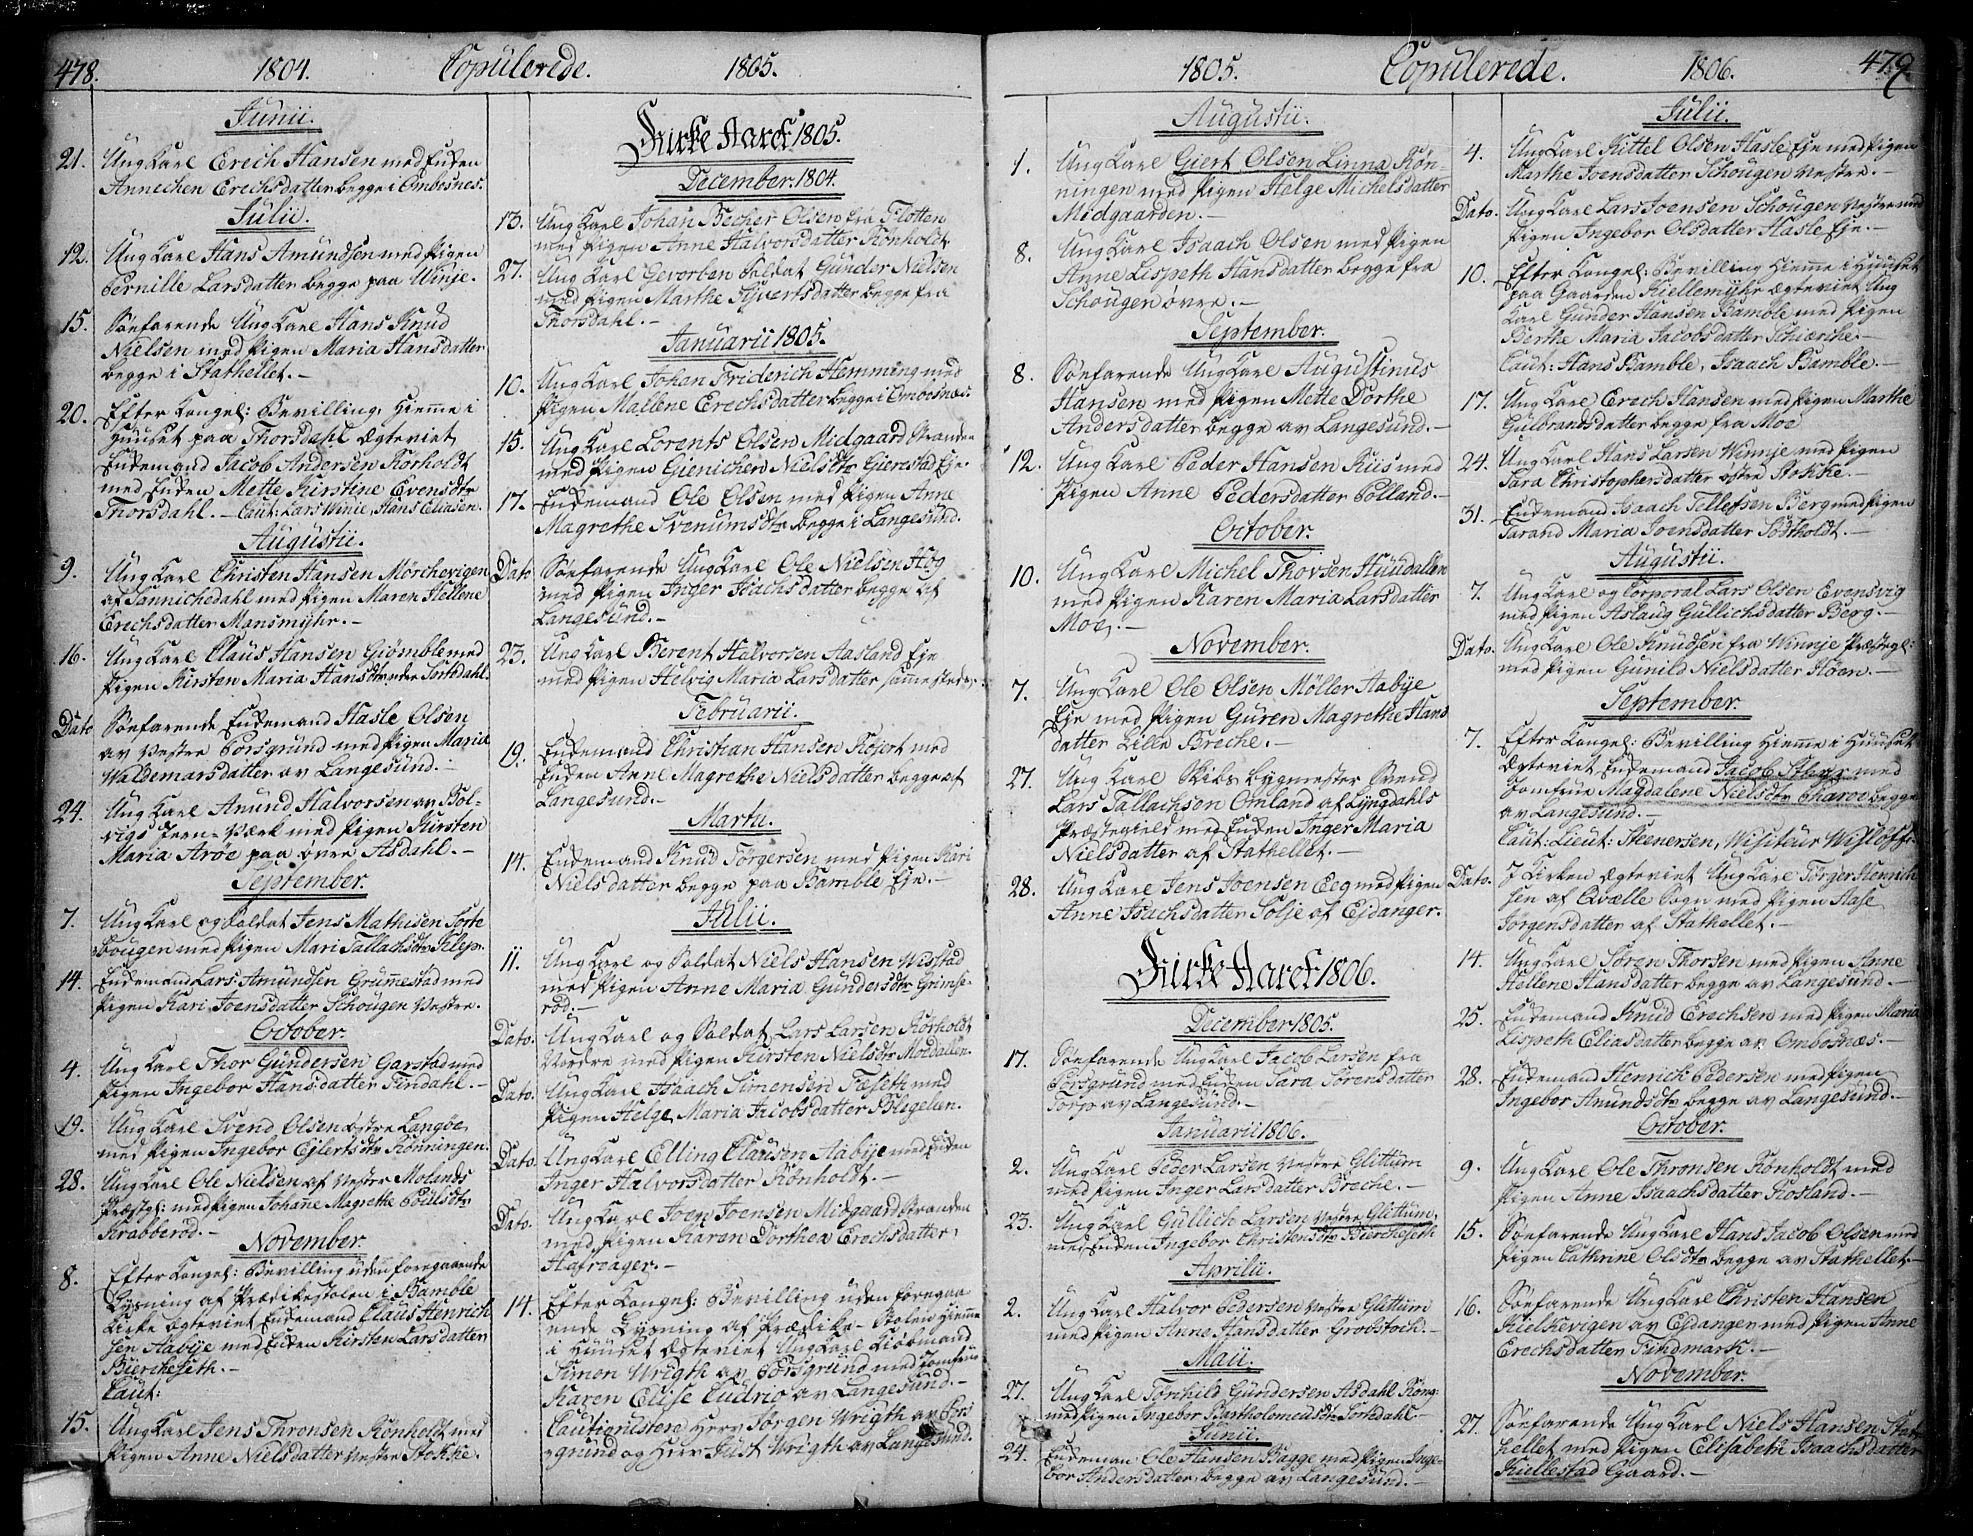 SAKO, Bamble kirkebøker, F/Fa/L0002: Ministerialbok nr. I 2, 1775-1814, s. 478-479